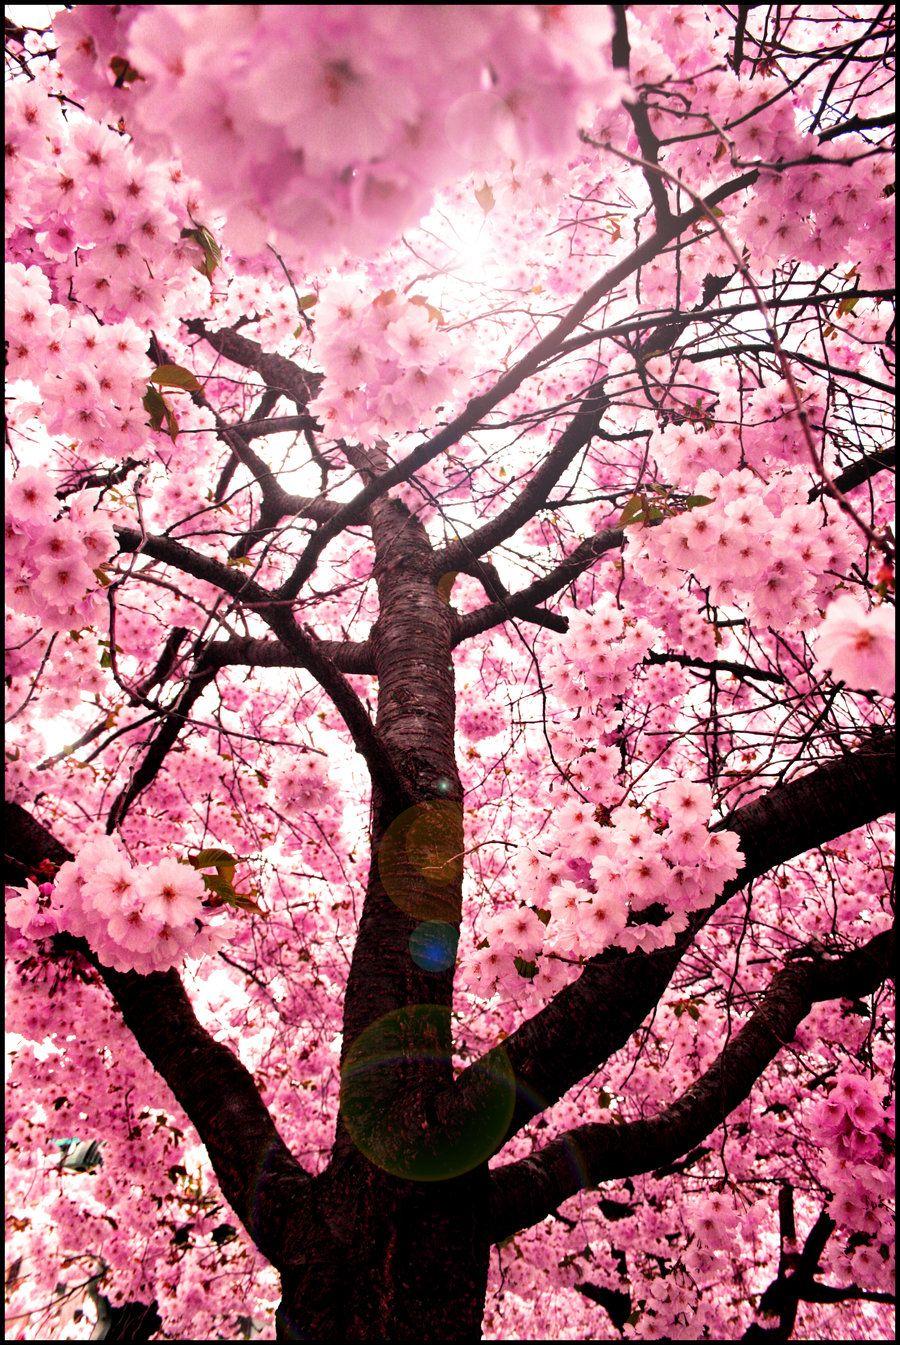 Sweet Red Cherry Blossom Tree By Yu Uki On Deviantart Cherry Blossom Wallpaper Cherry Blossom Art Blossom Trees